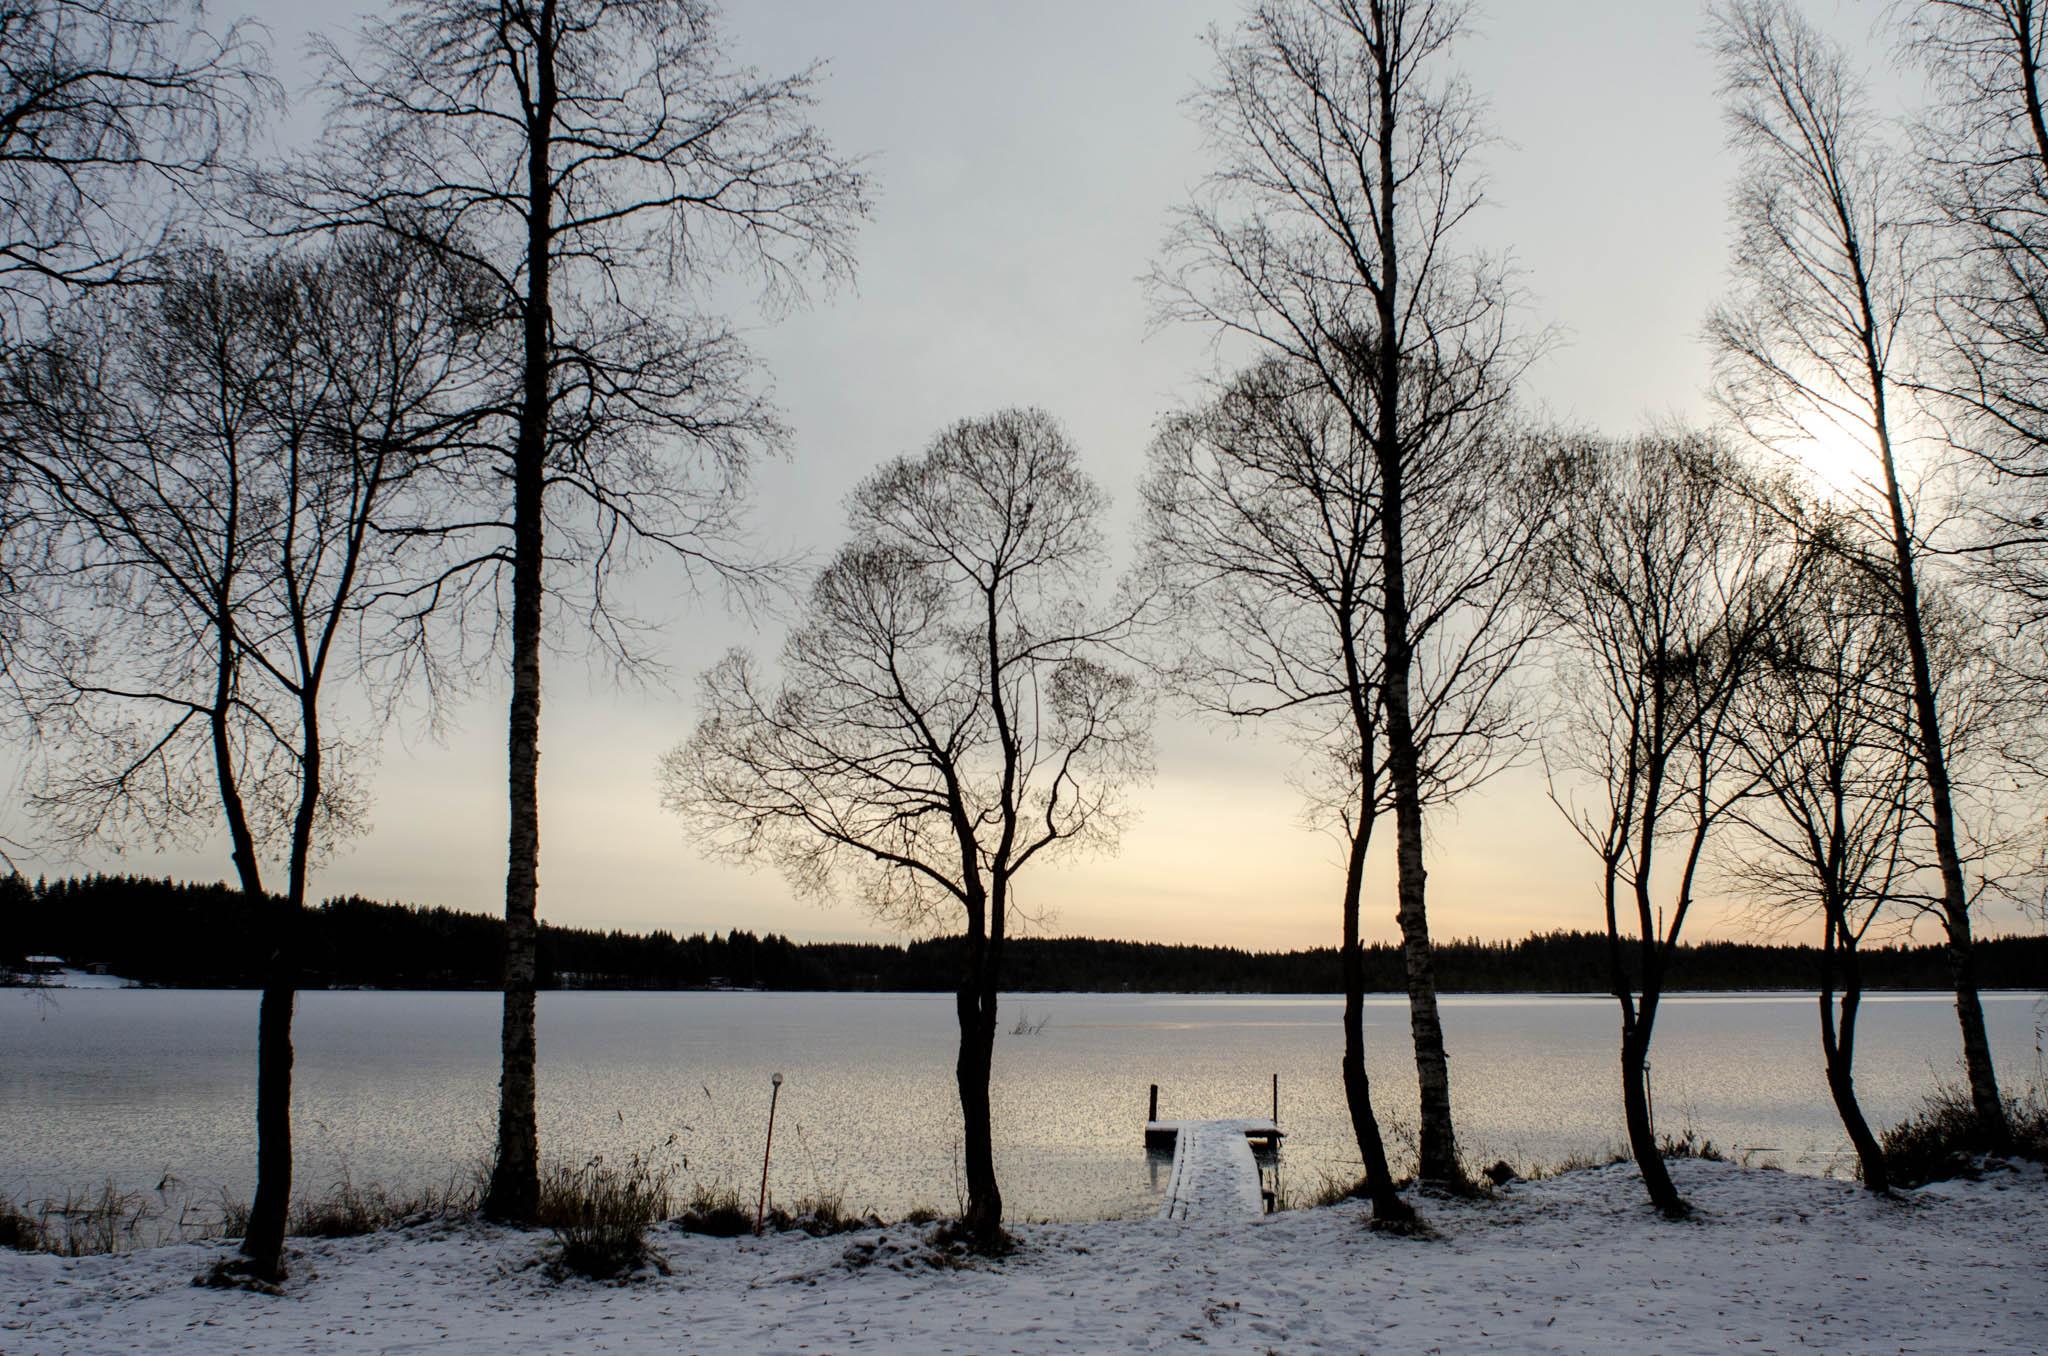 View of the lake Alavi's yard - Still, Tom Miller